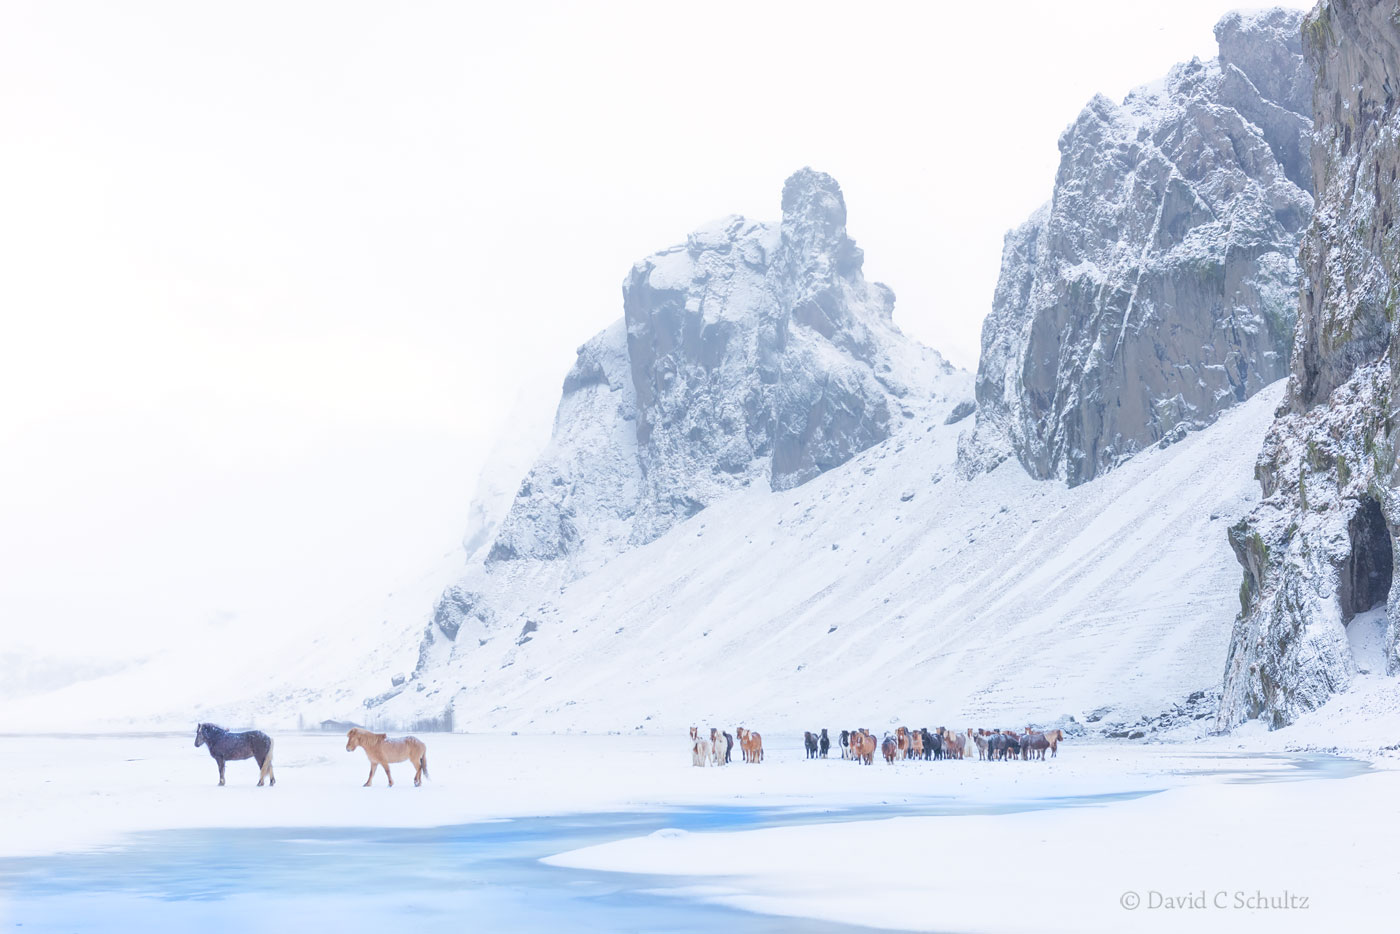 Winter and Icelandic Horses - Image #47-2843